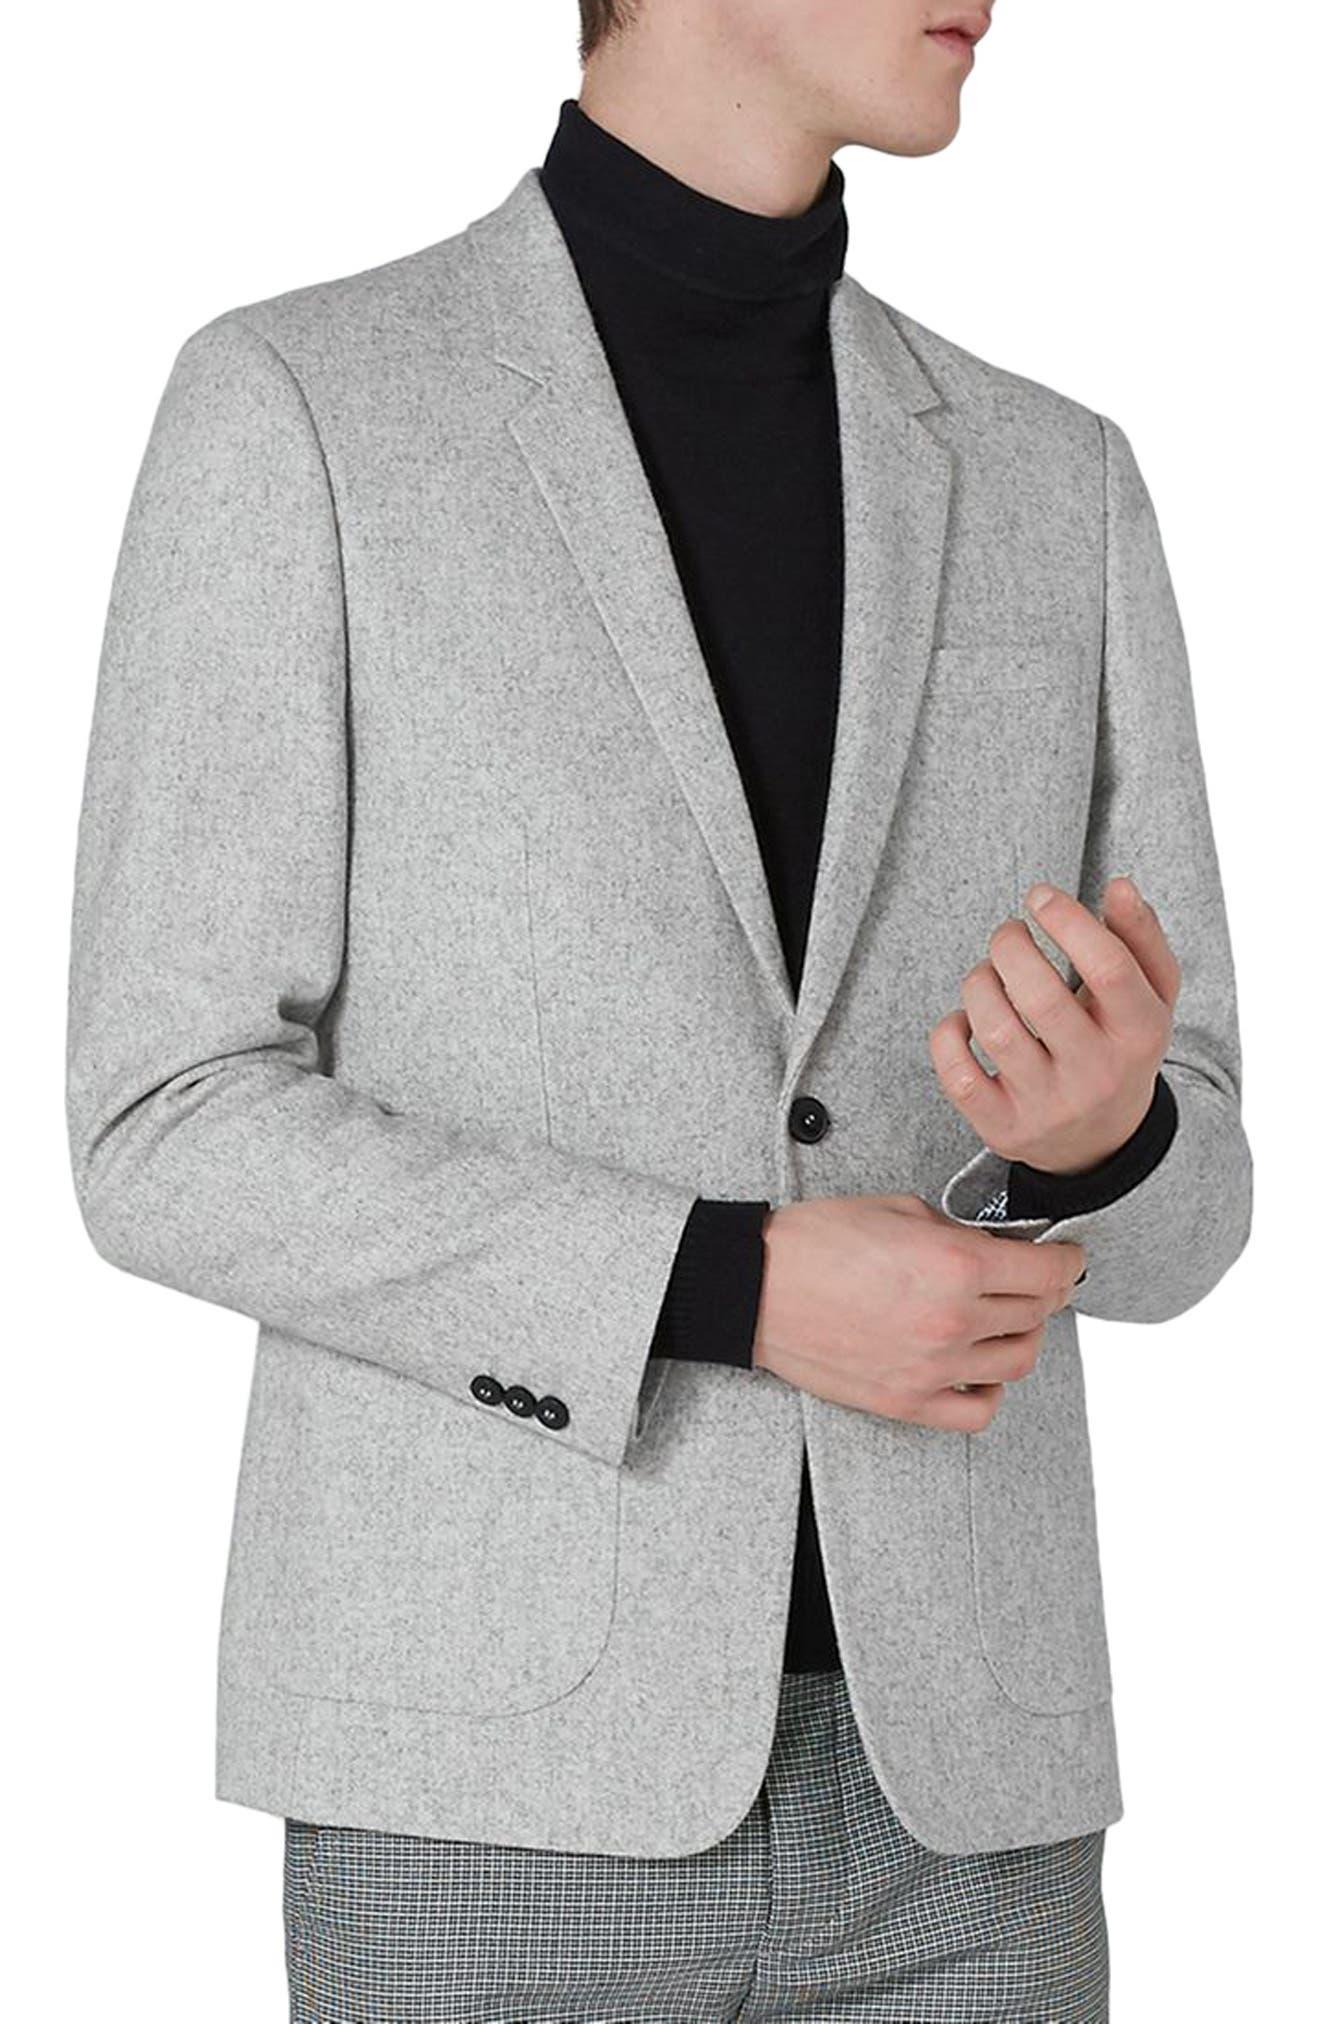 Murdoch One-Button Jacket,                         Main,                         color, Light Grey